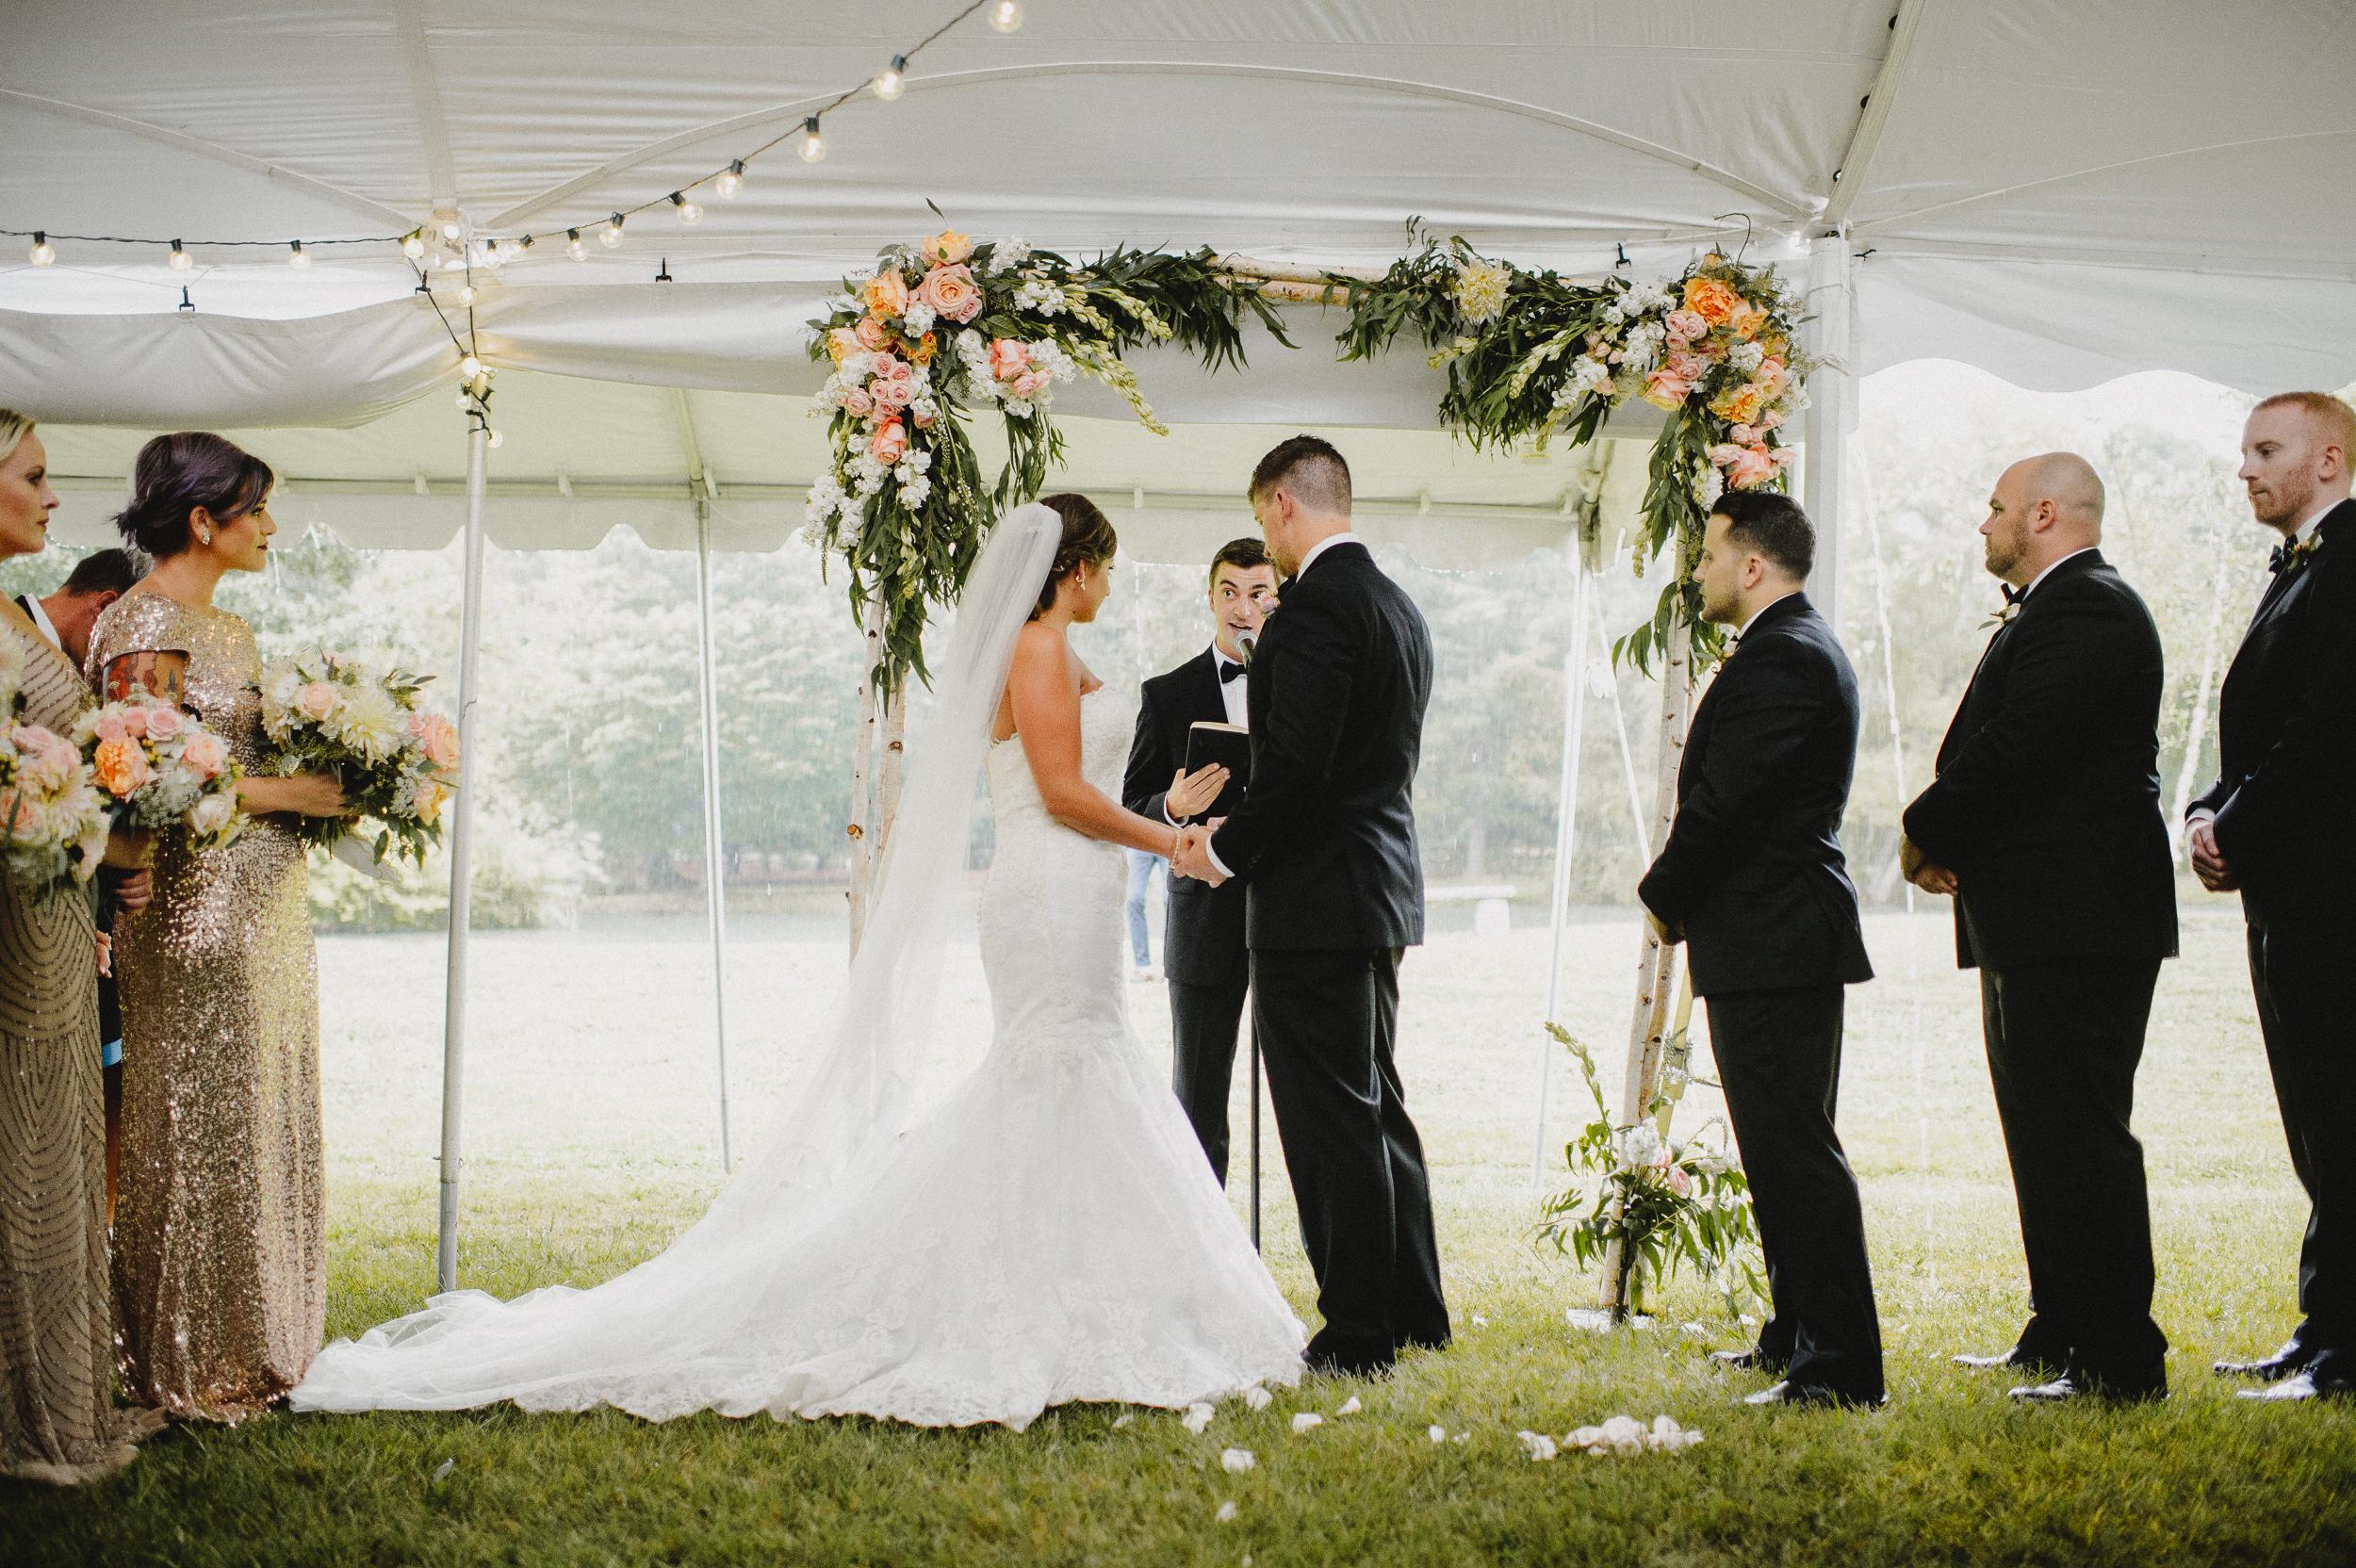 delaware-estate-wedding-photographer-pat-robinson-photography-90.jpg